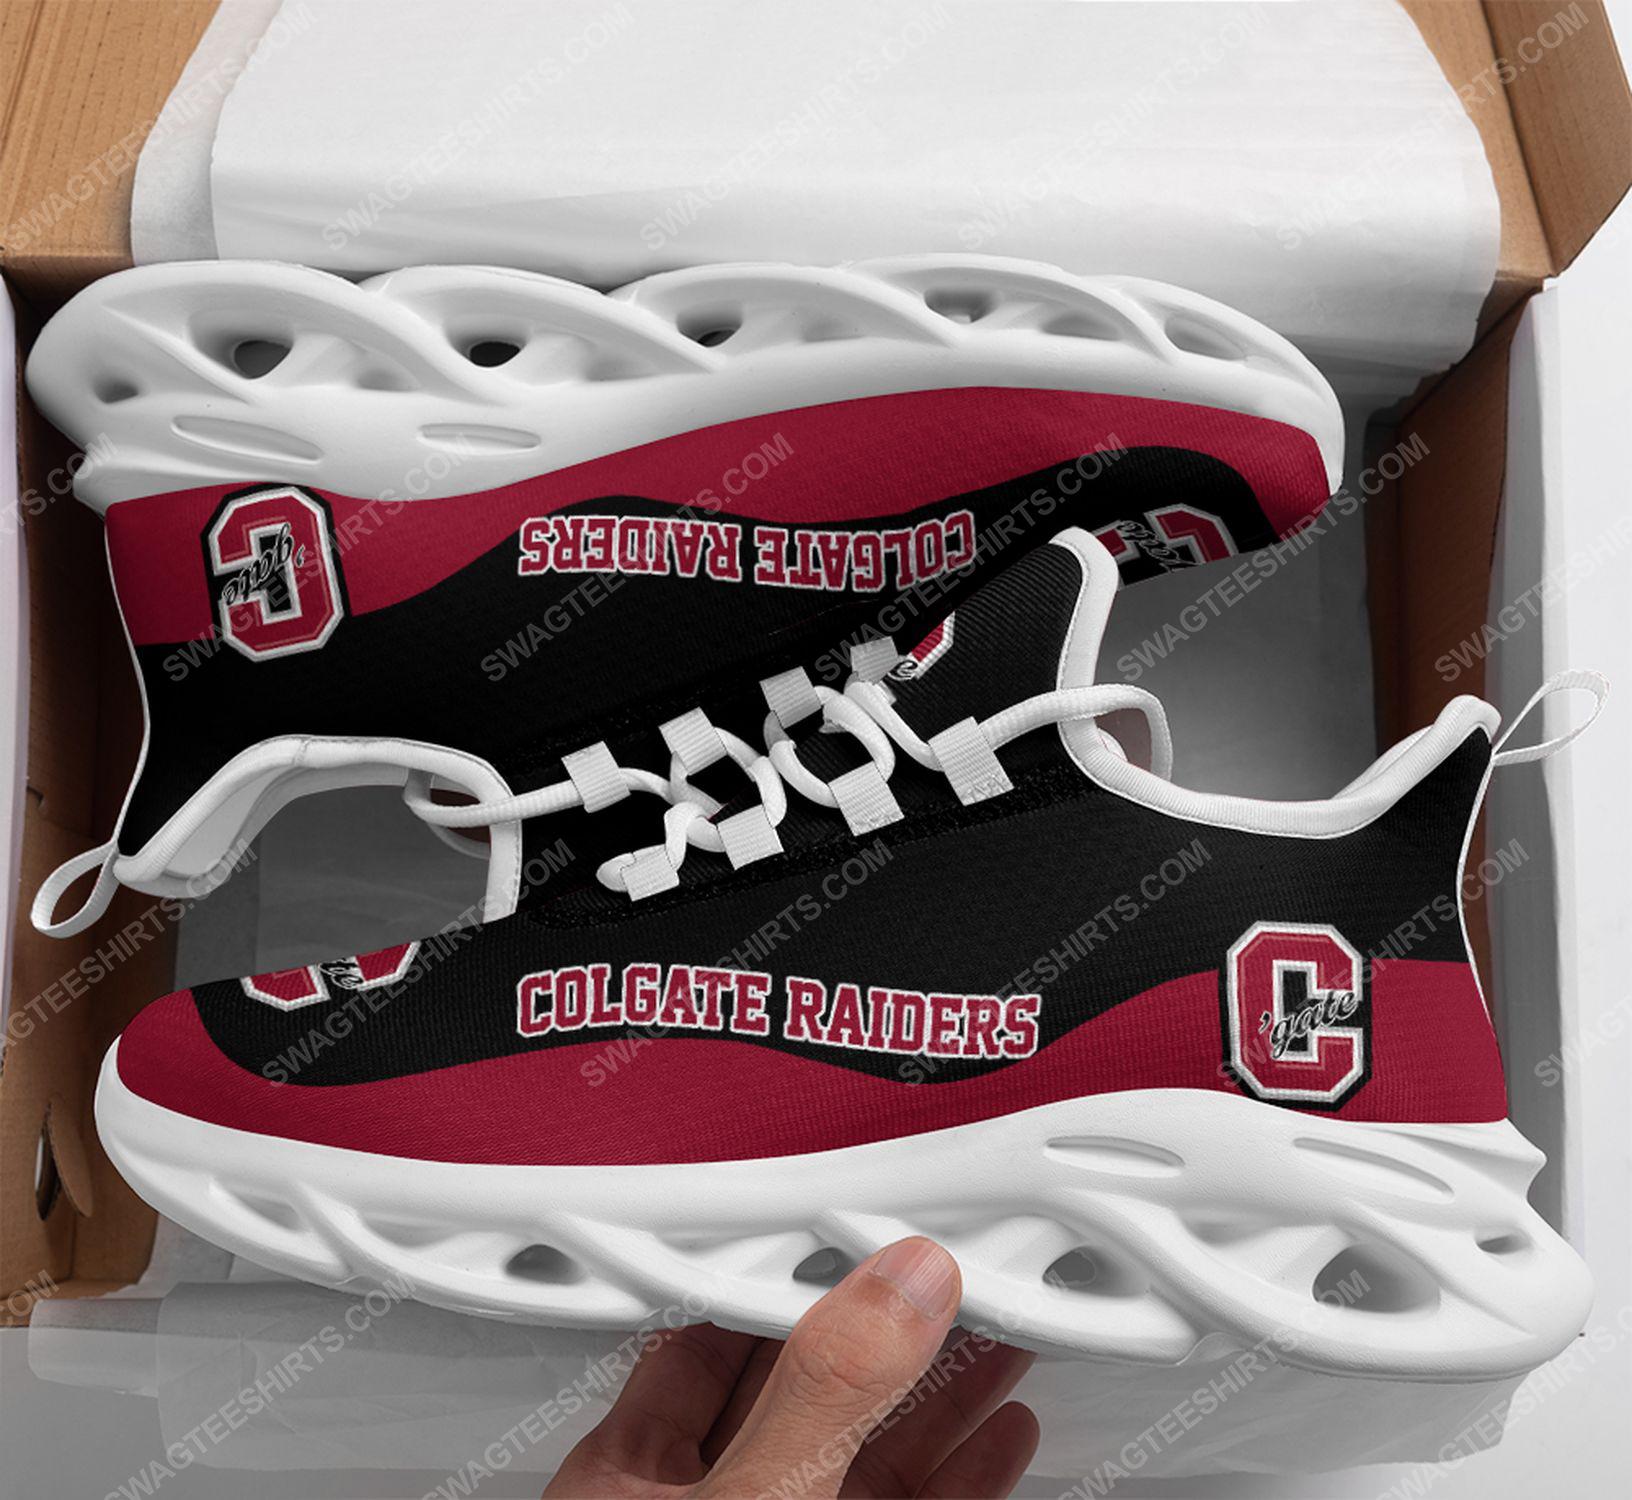 The colgate raiders football team max soul shoes 1